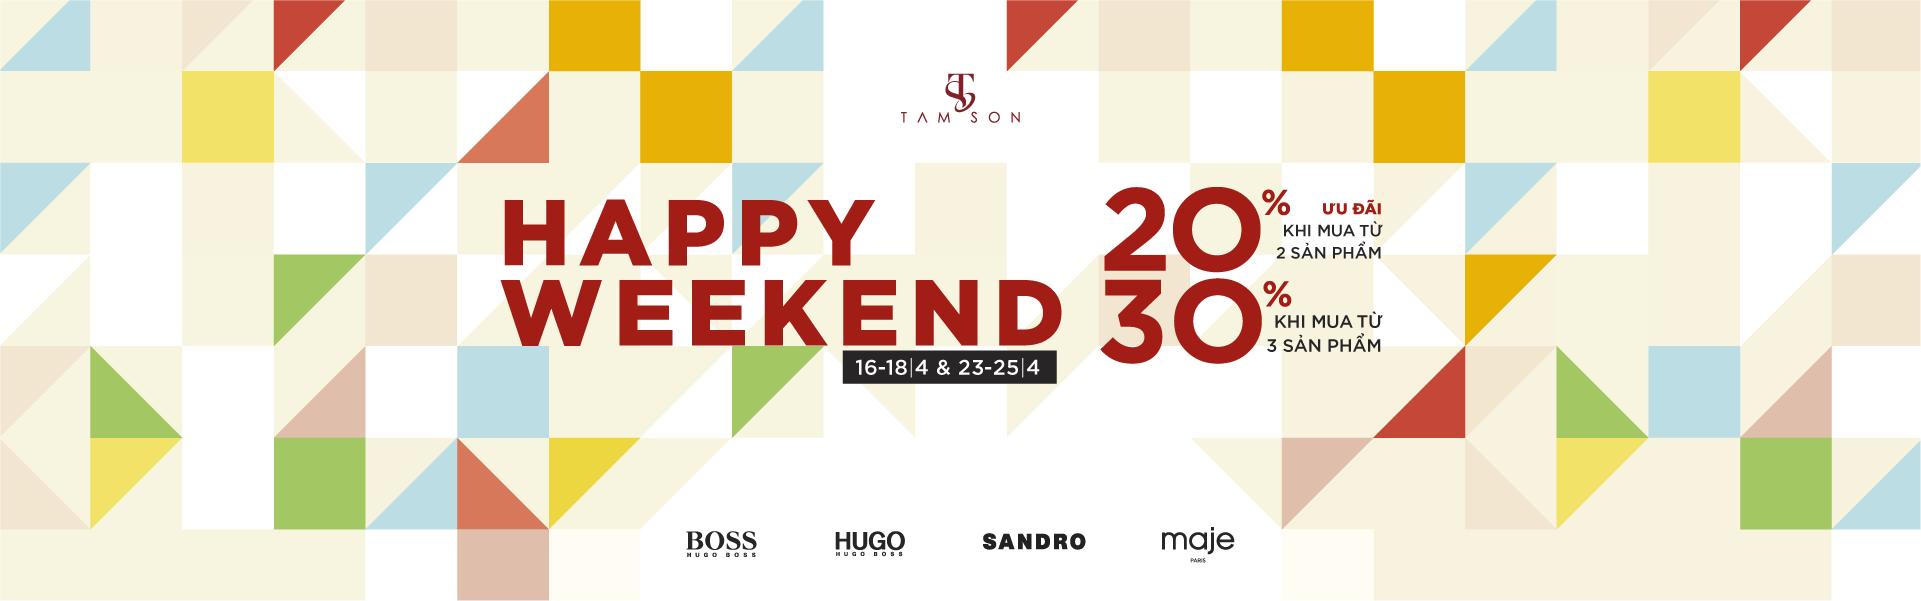 Happy weekend 2021 1